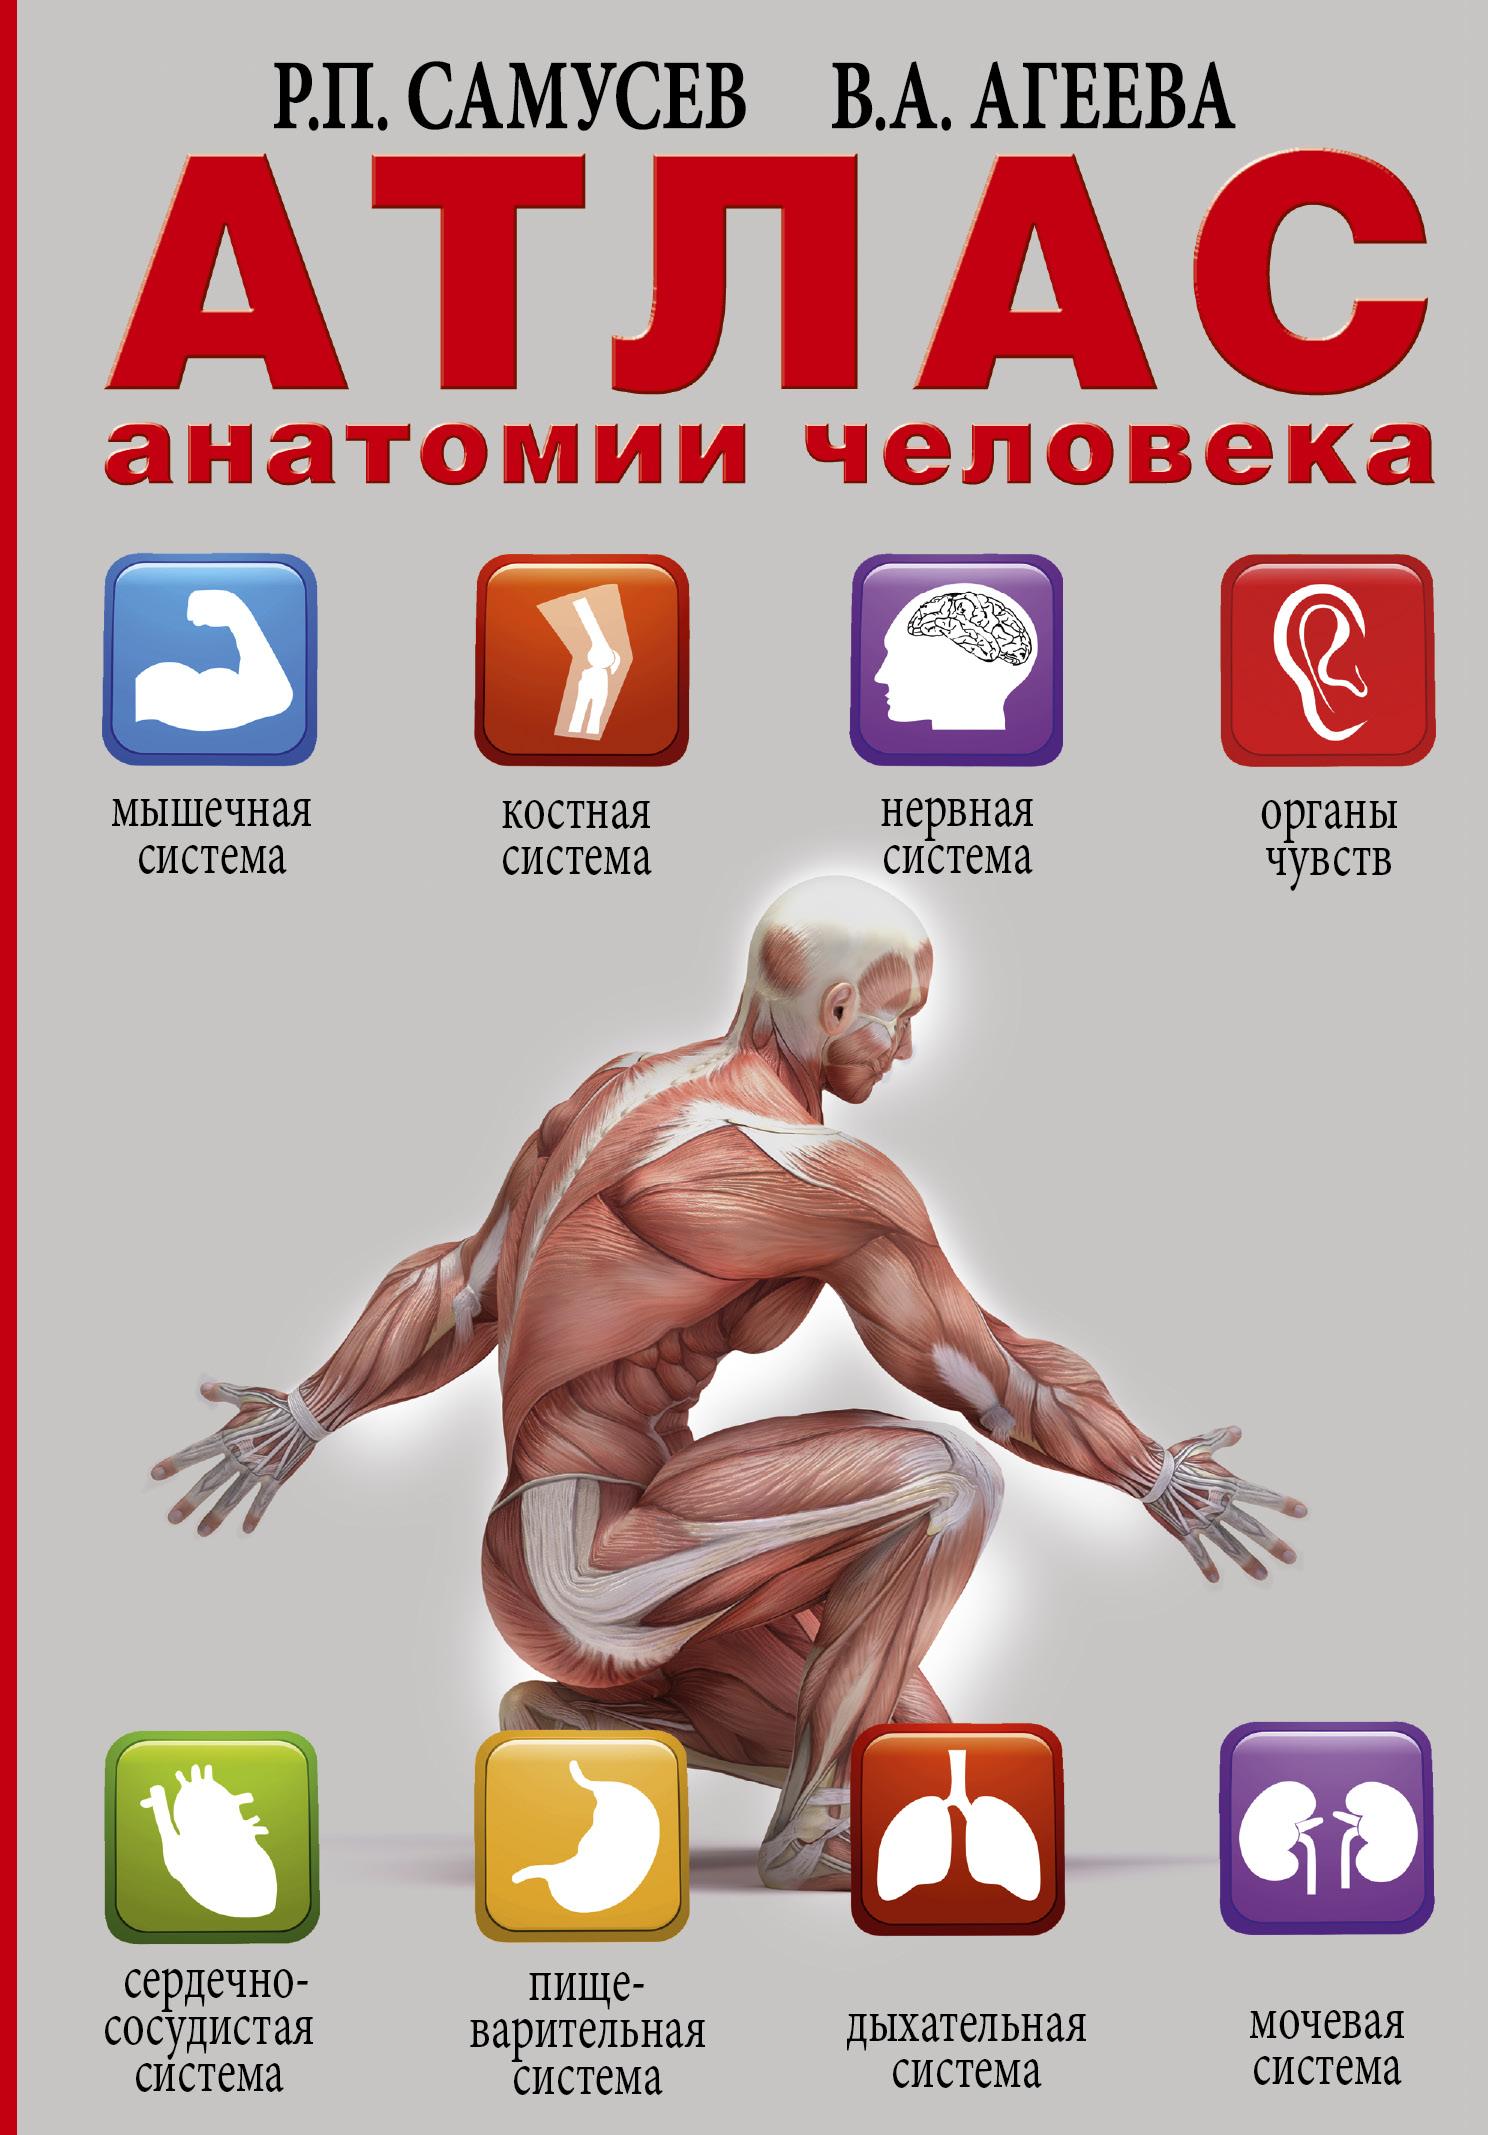 Самусев Р.П. Атлас анатомии человека самусев р атлас анатомии человека